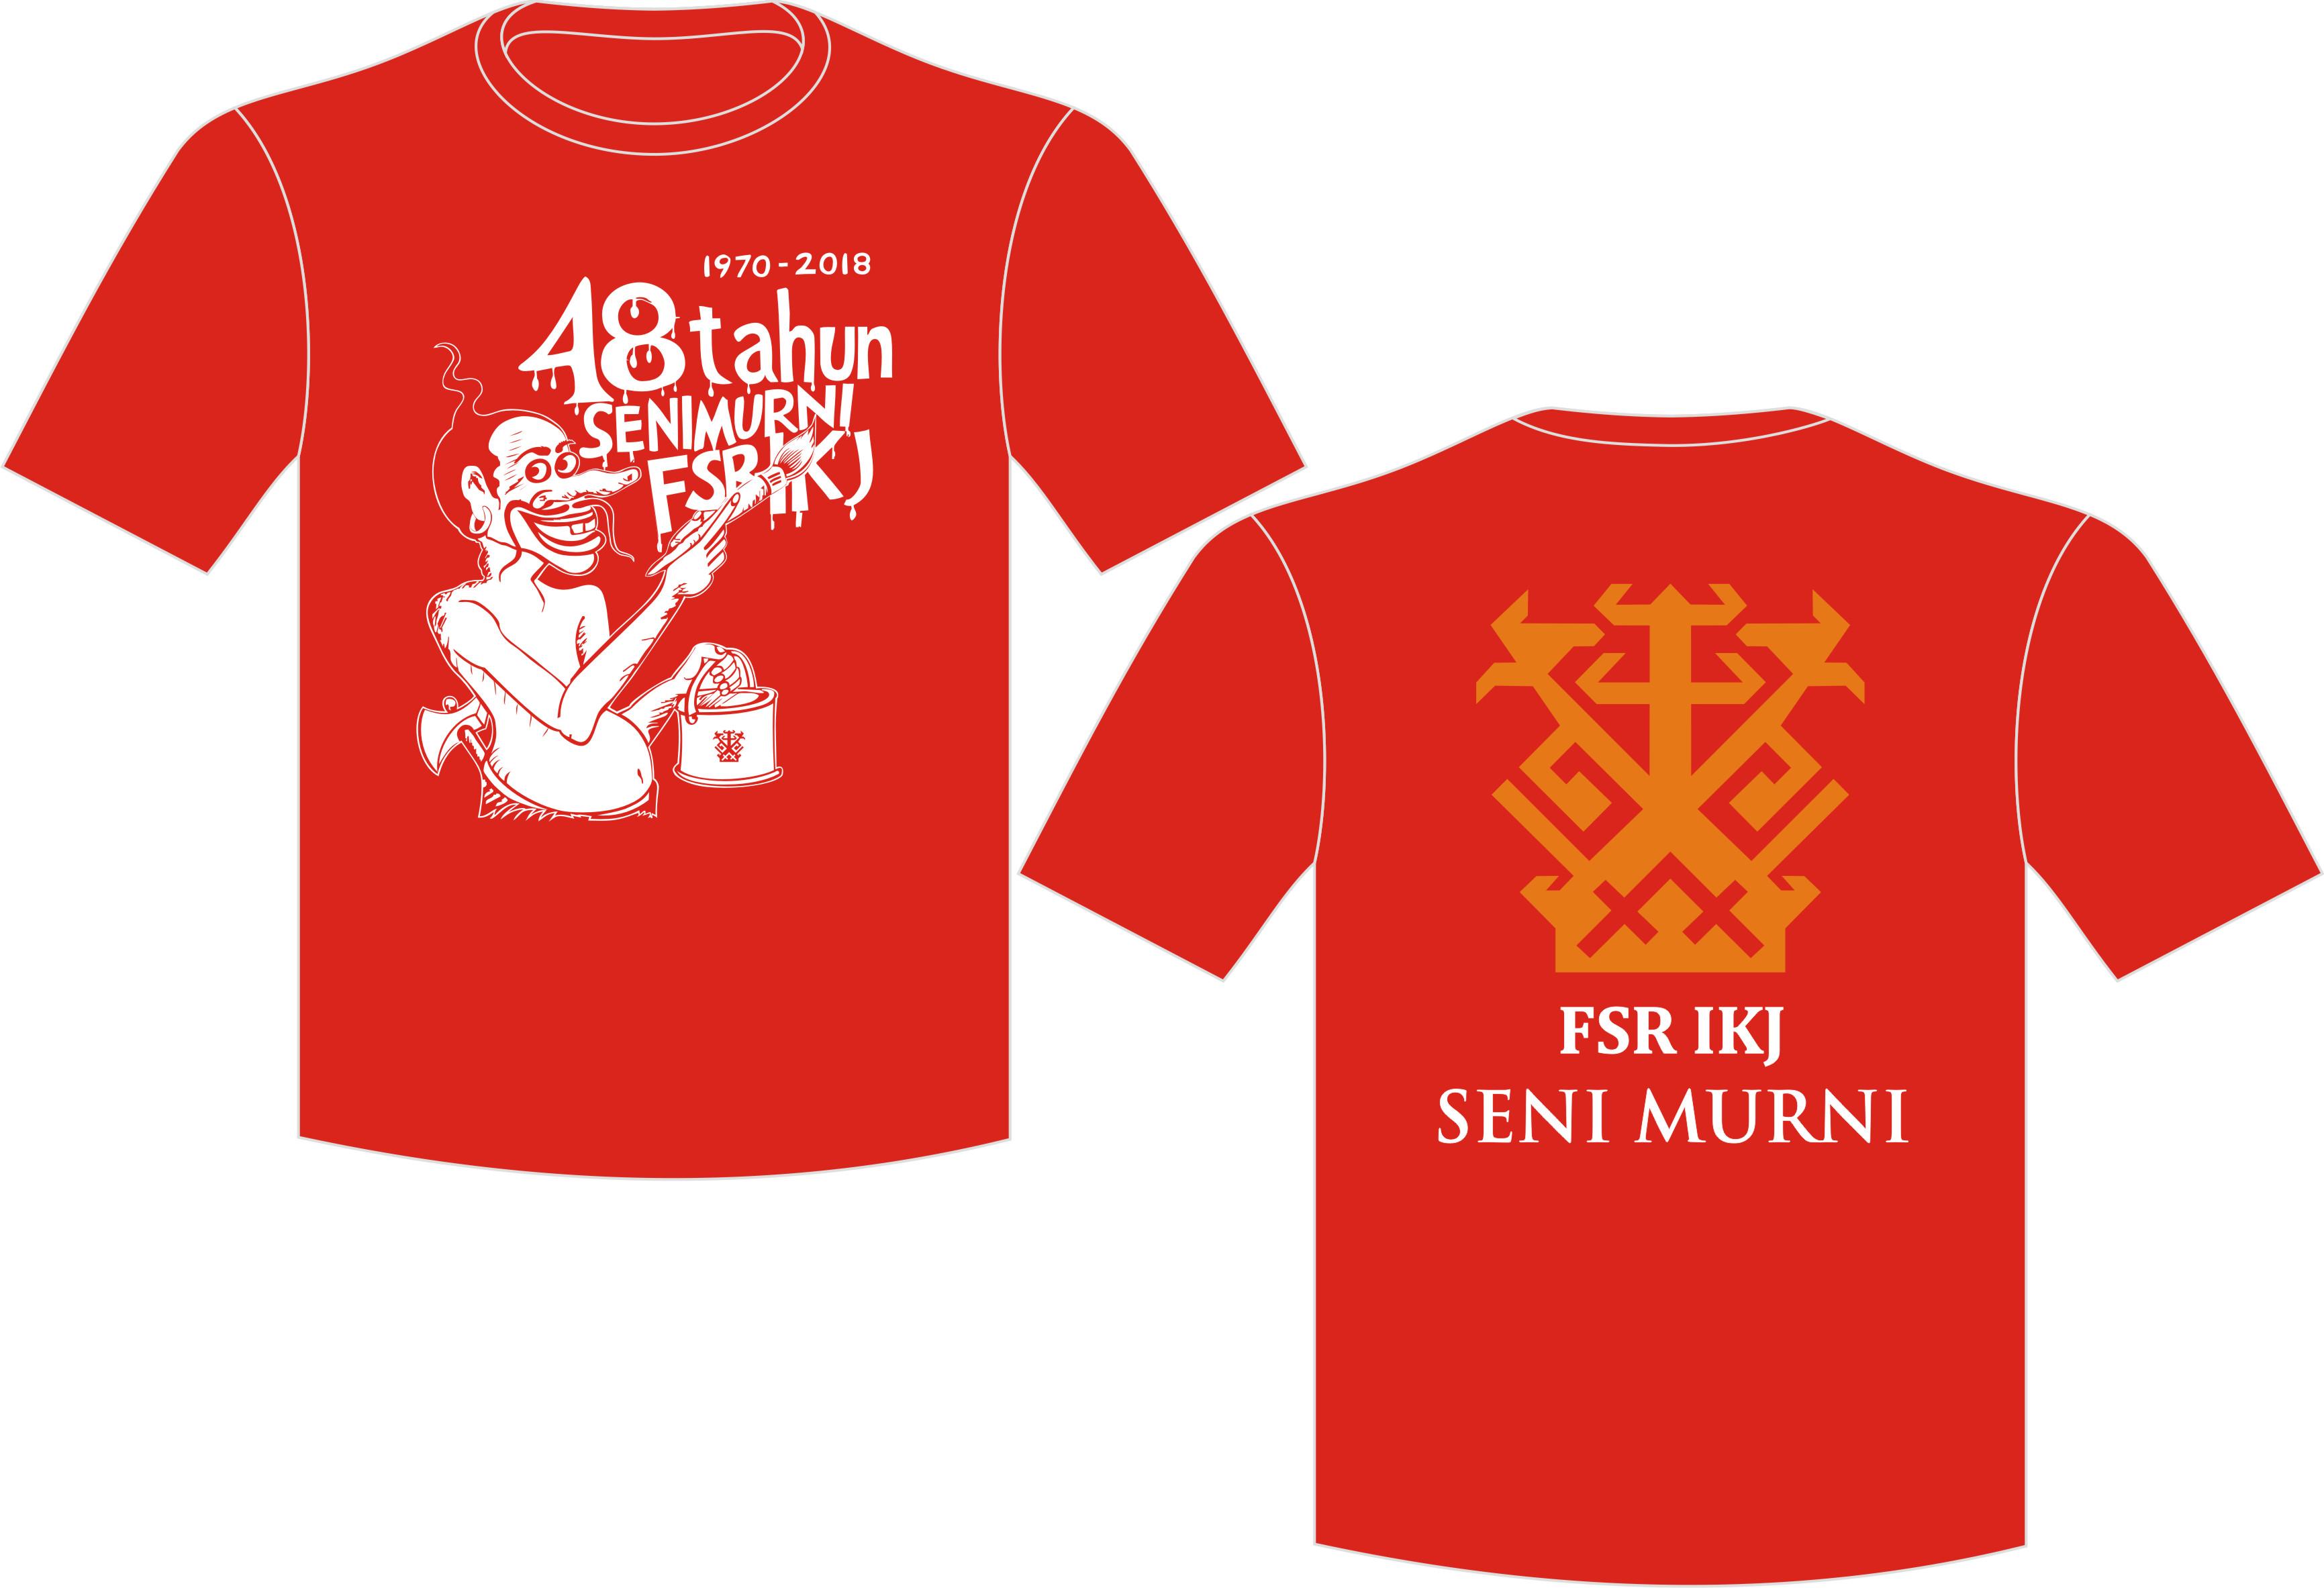 Seragam Kaos Merah